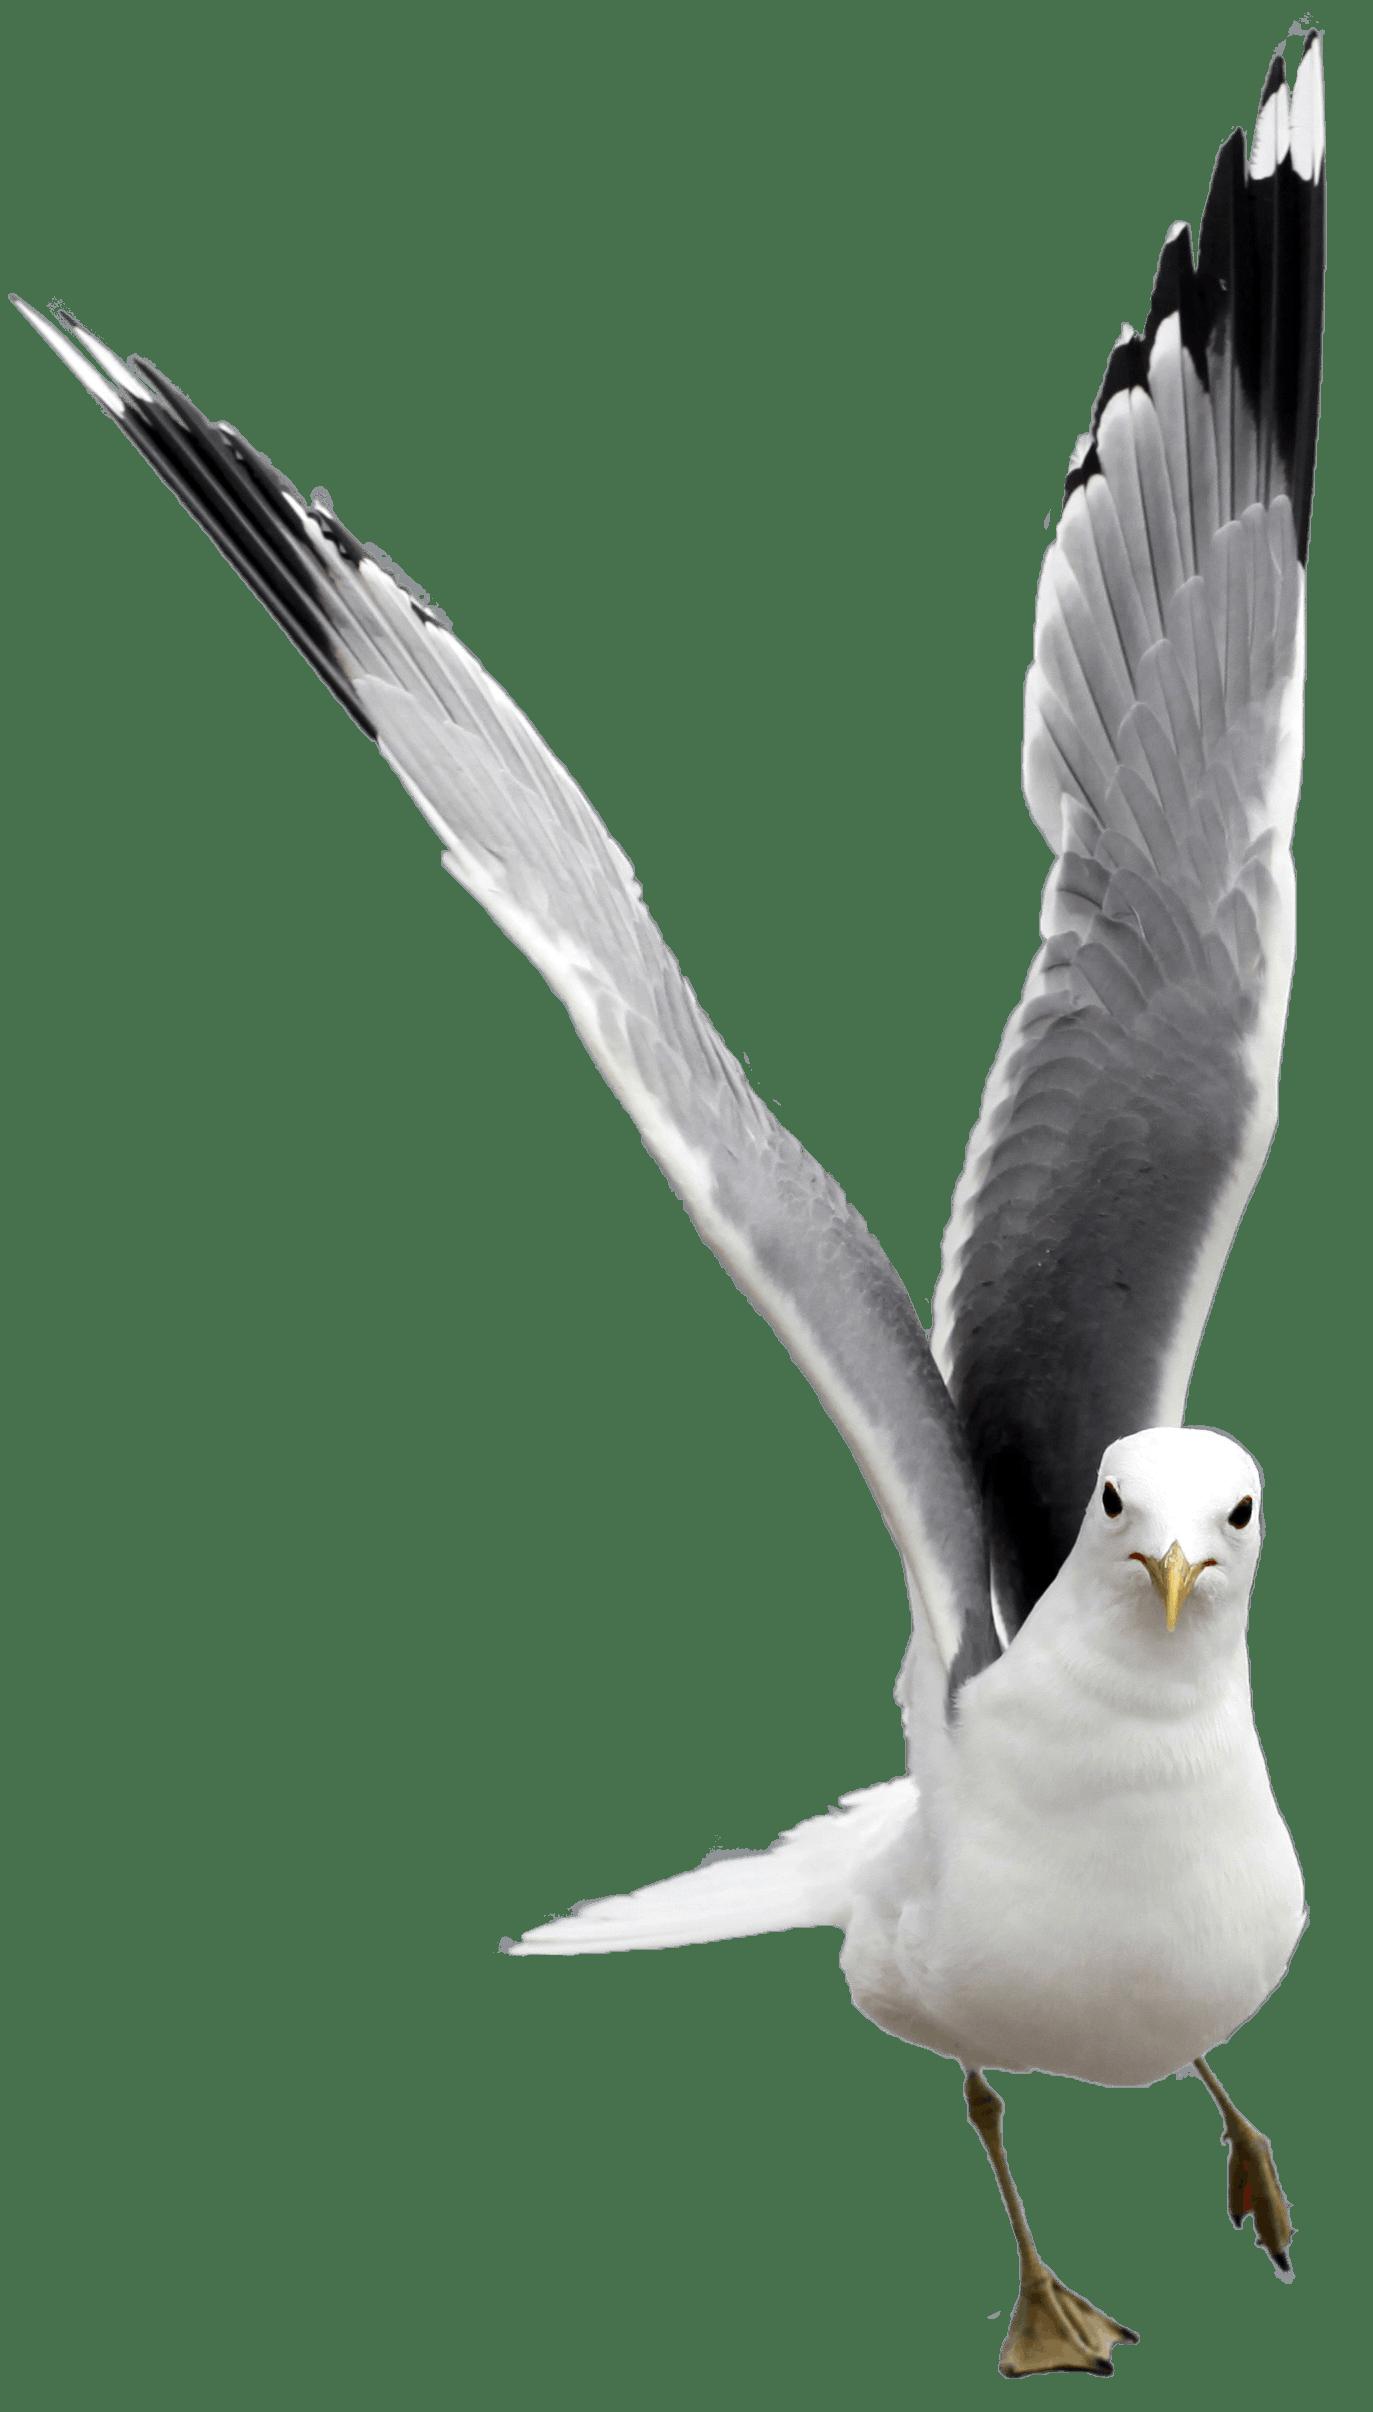 Free stock photo of animal, Baltic Sea, beach, birds